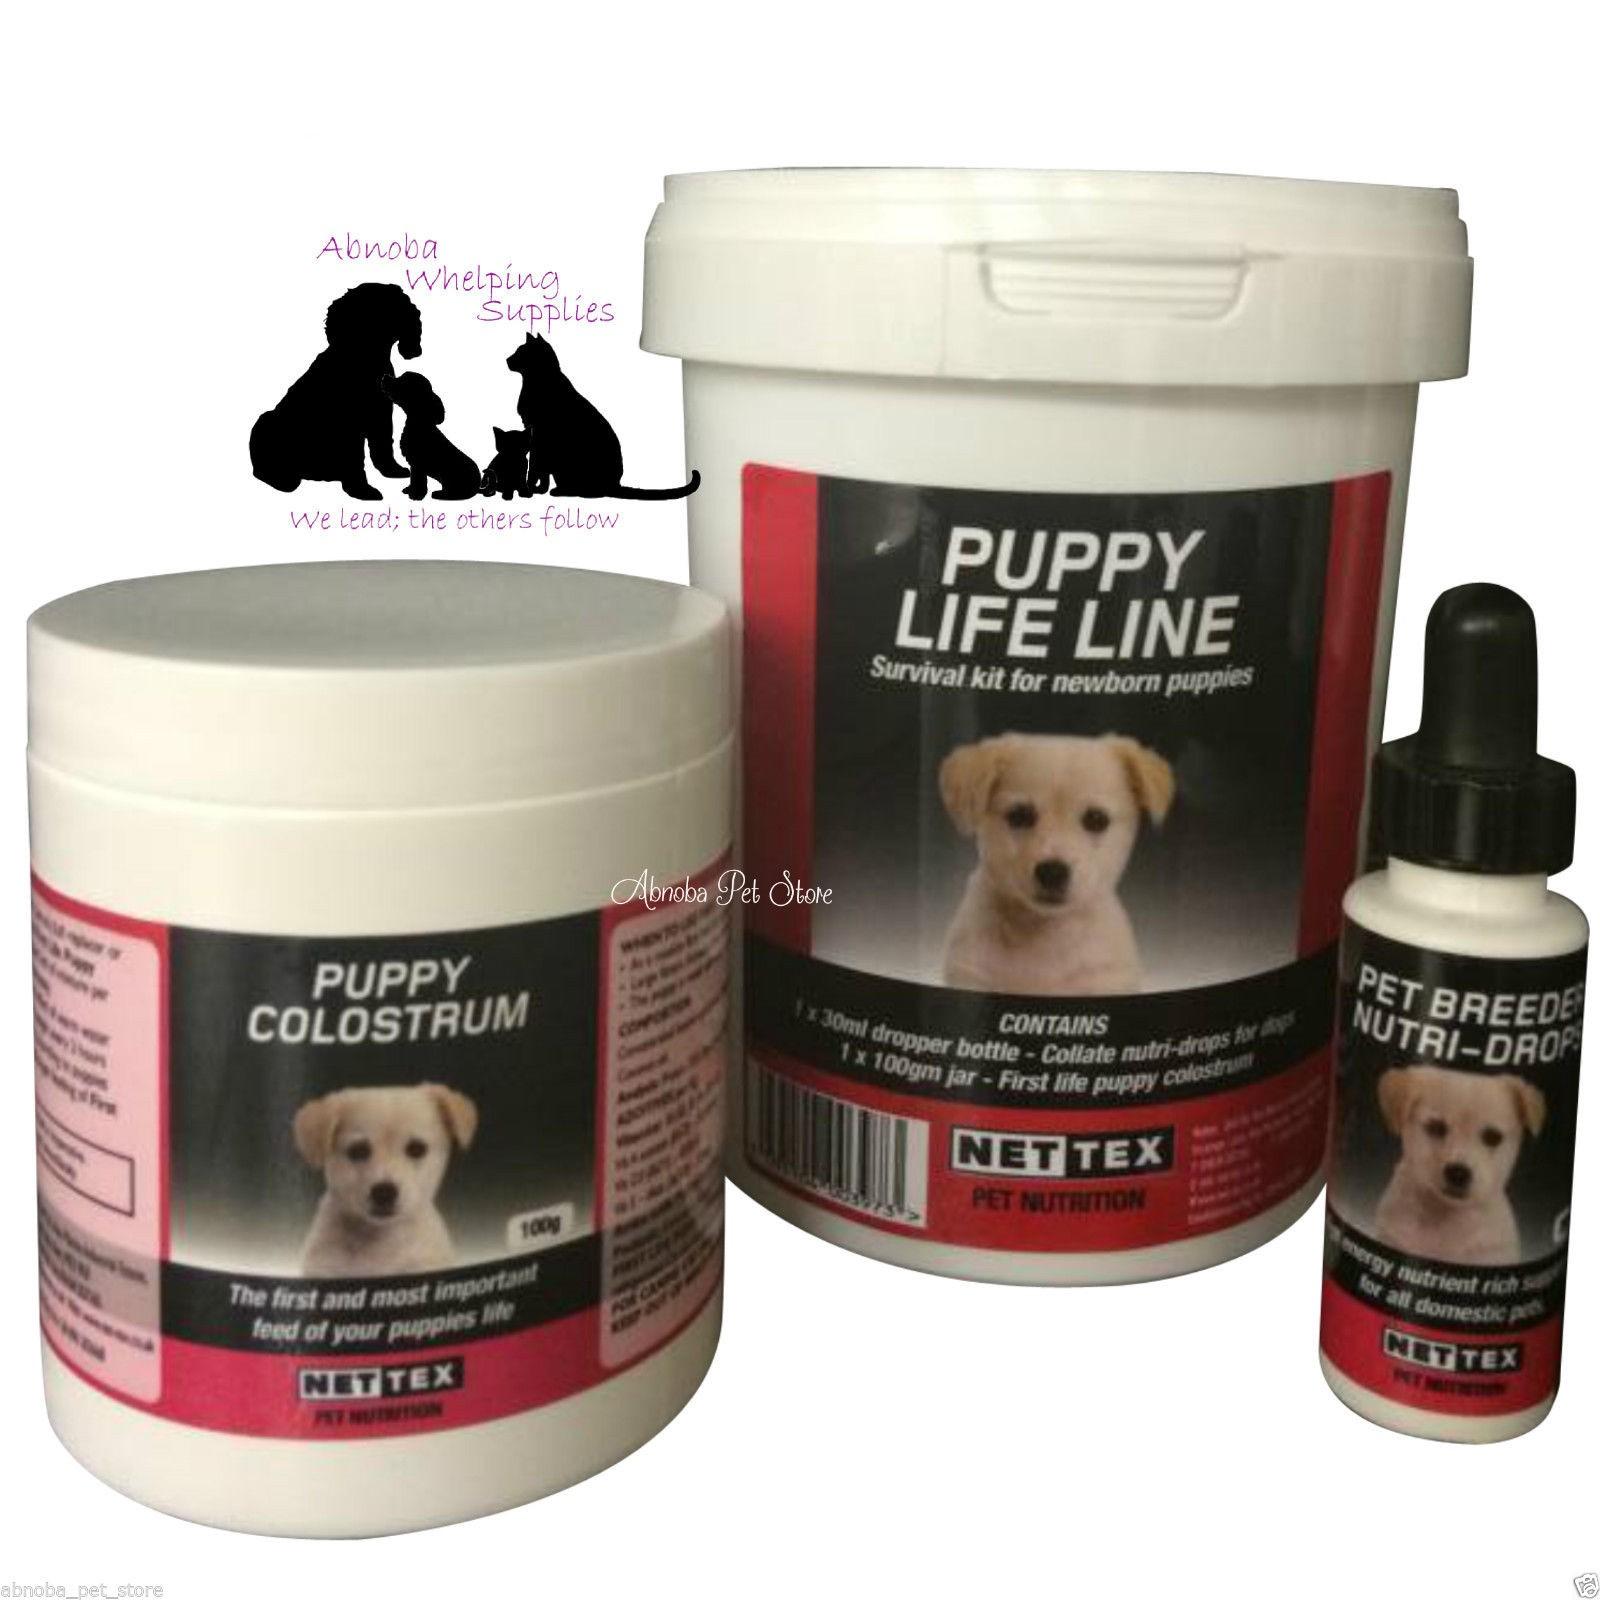 Nettex Life-Line puppy Net-tex survival kits for newborns,